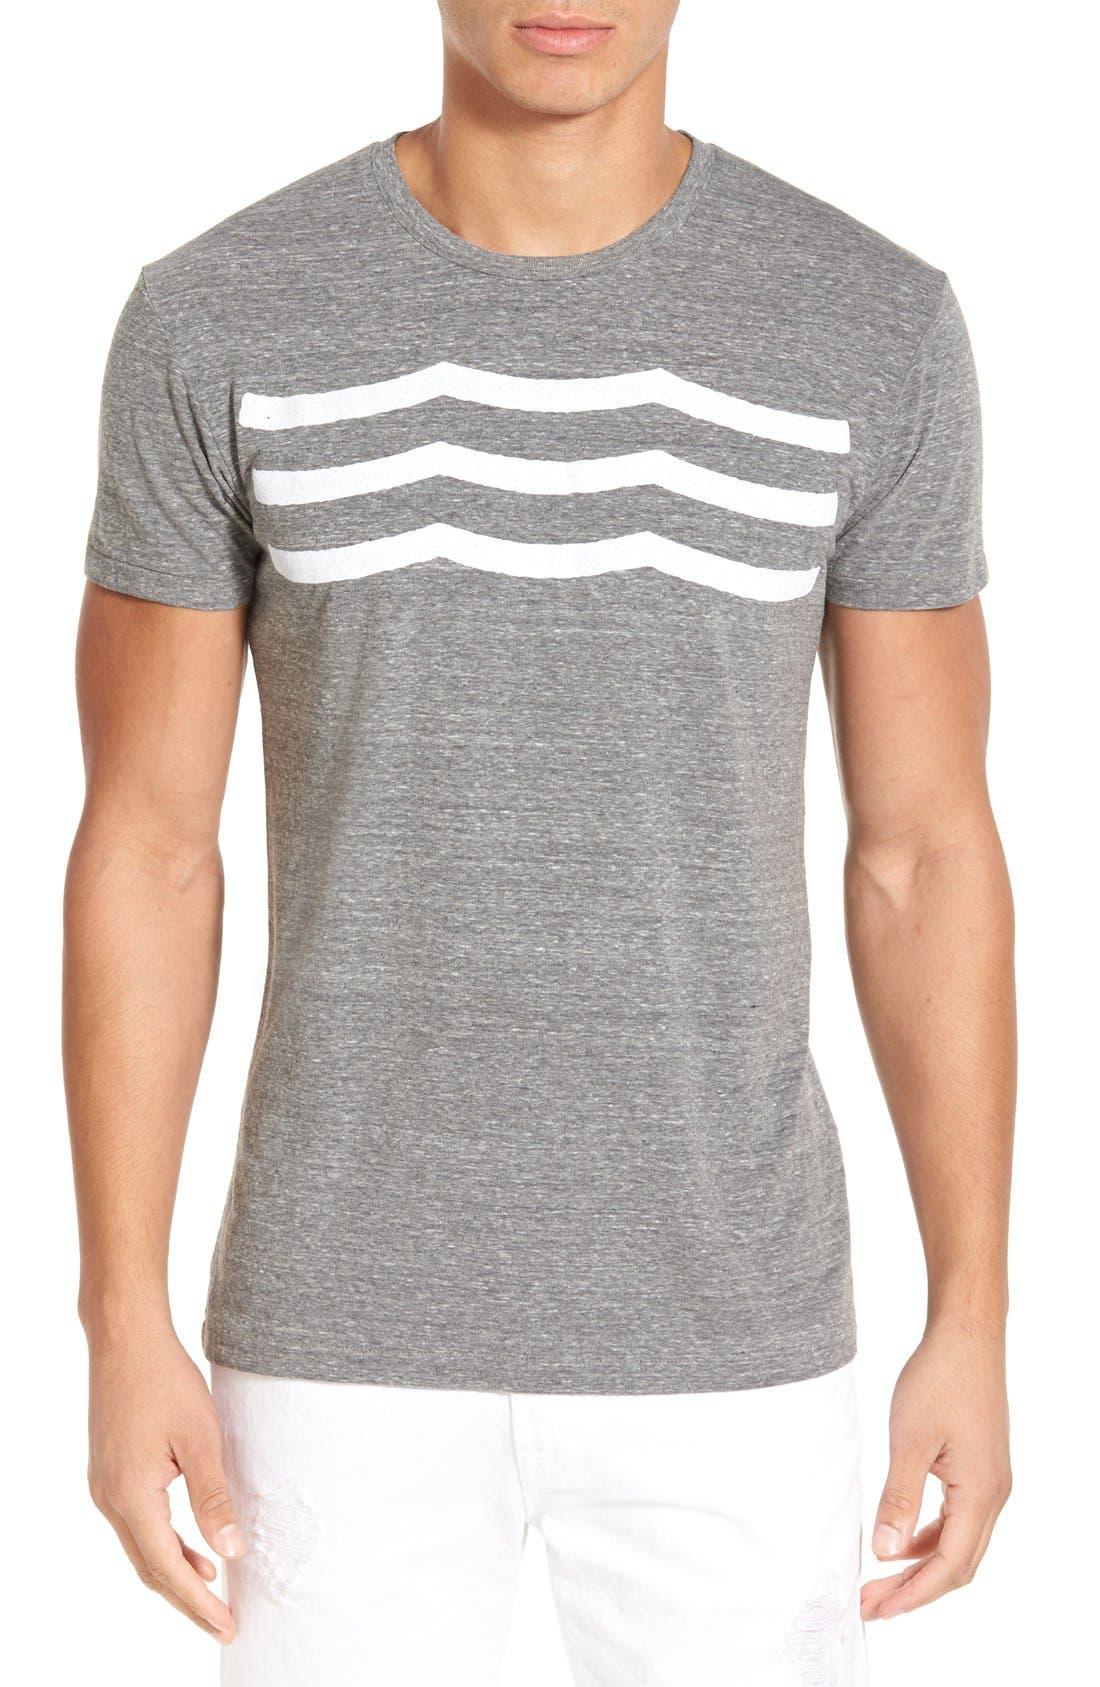 'Waves' Graphic T-Shirt,                             Main thumbnail 1, color,                             Heather Grey